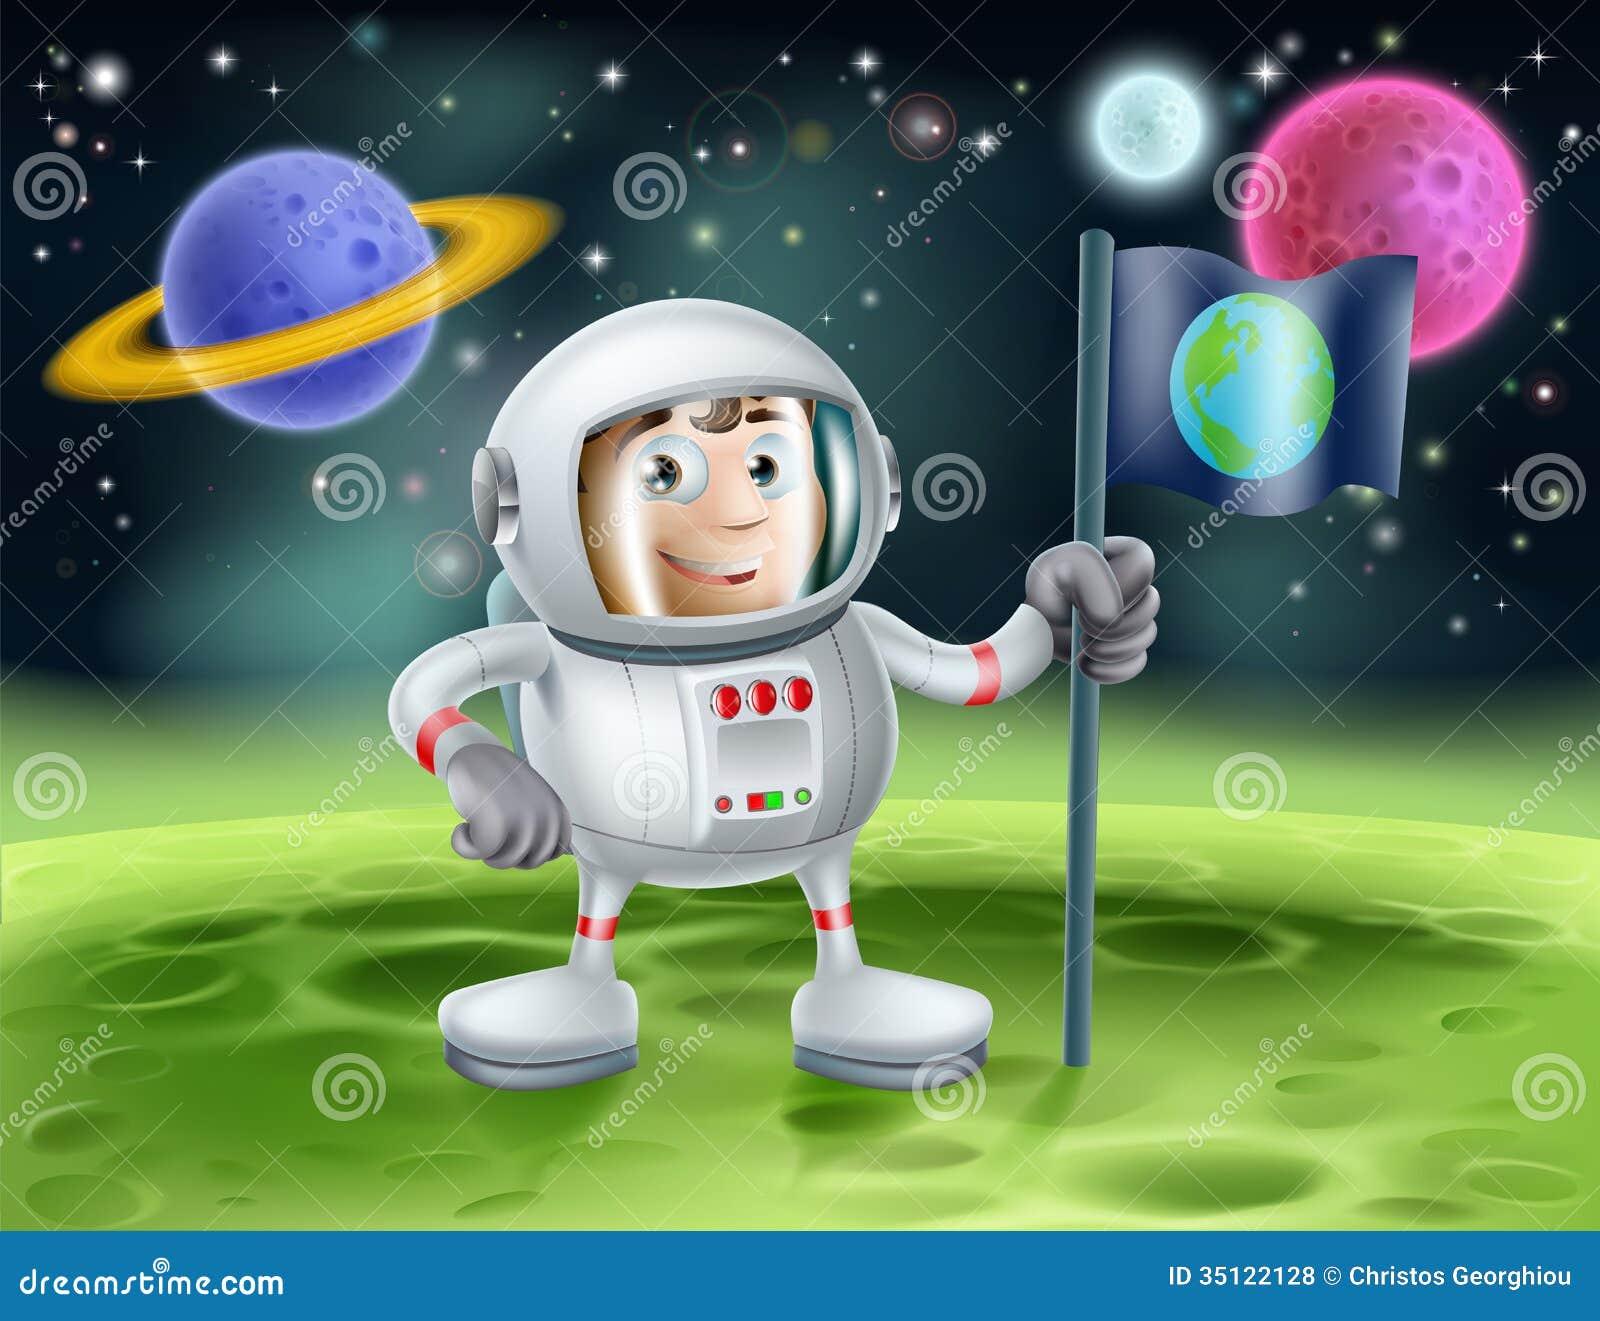 Astronauta kosmosu kreskówka